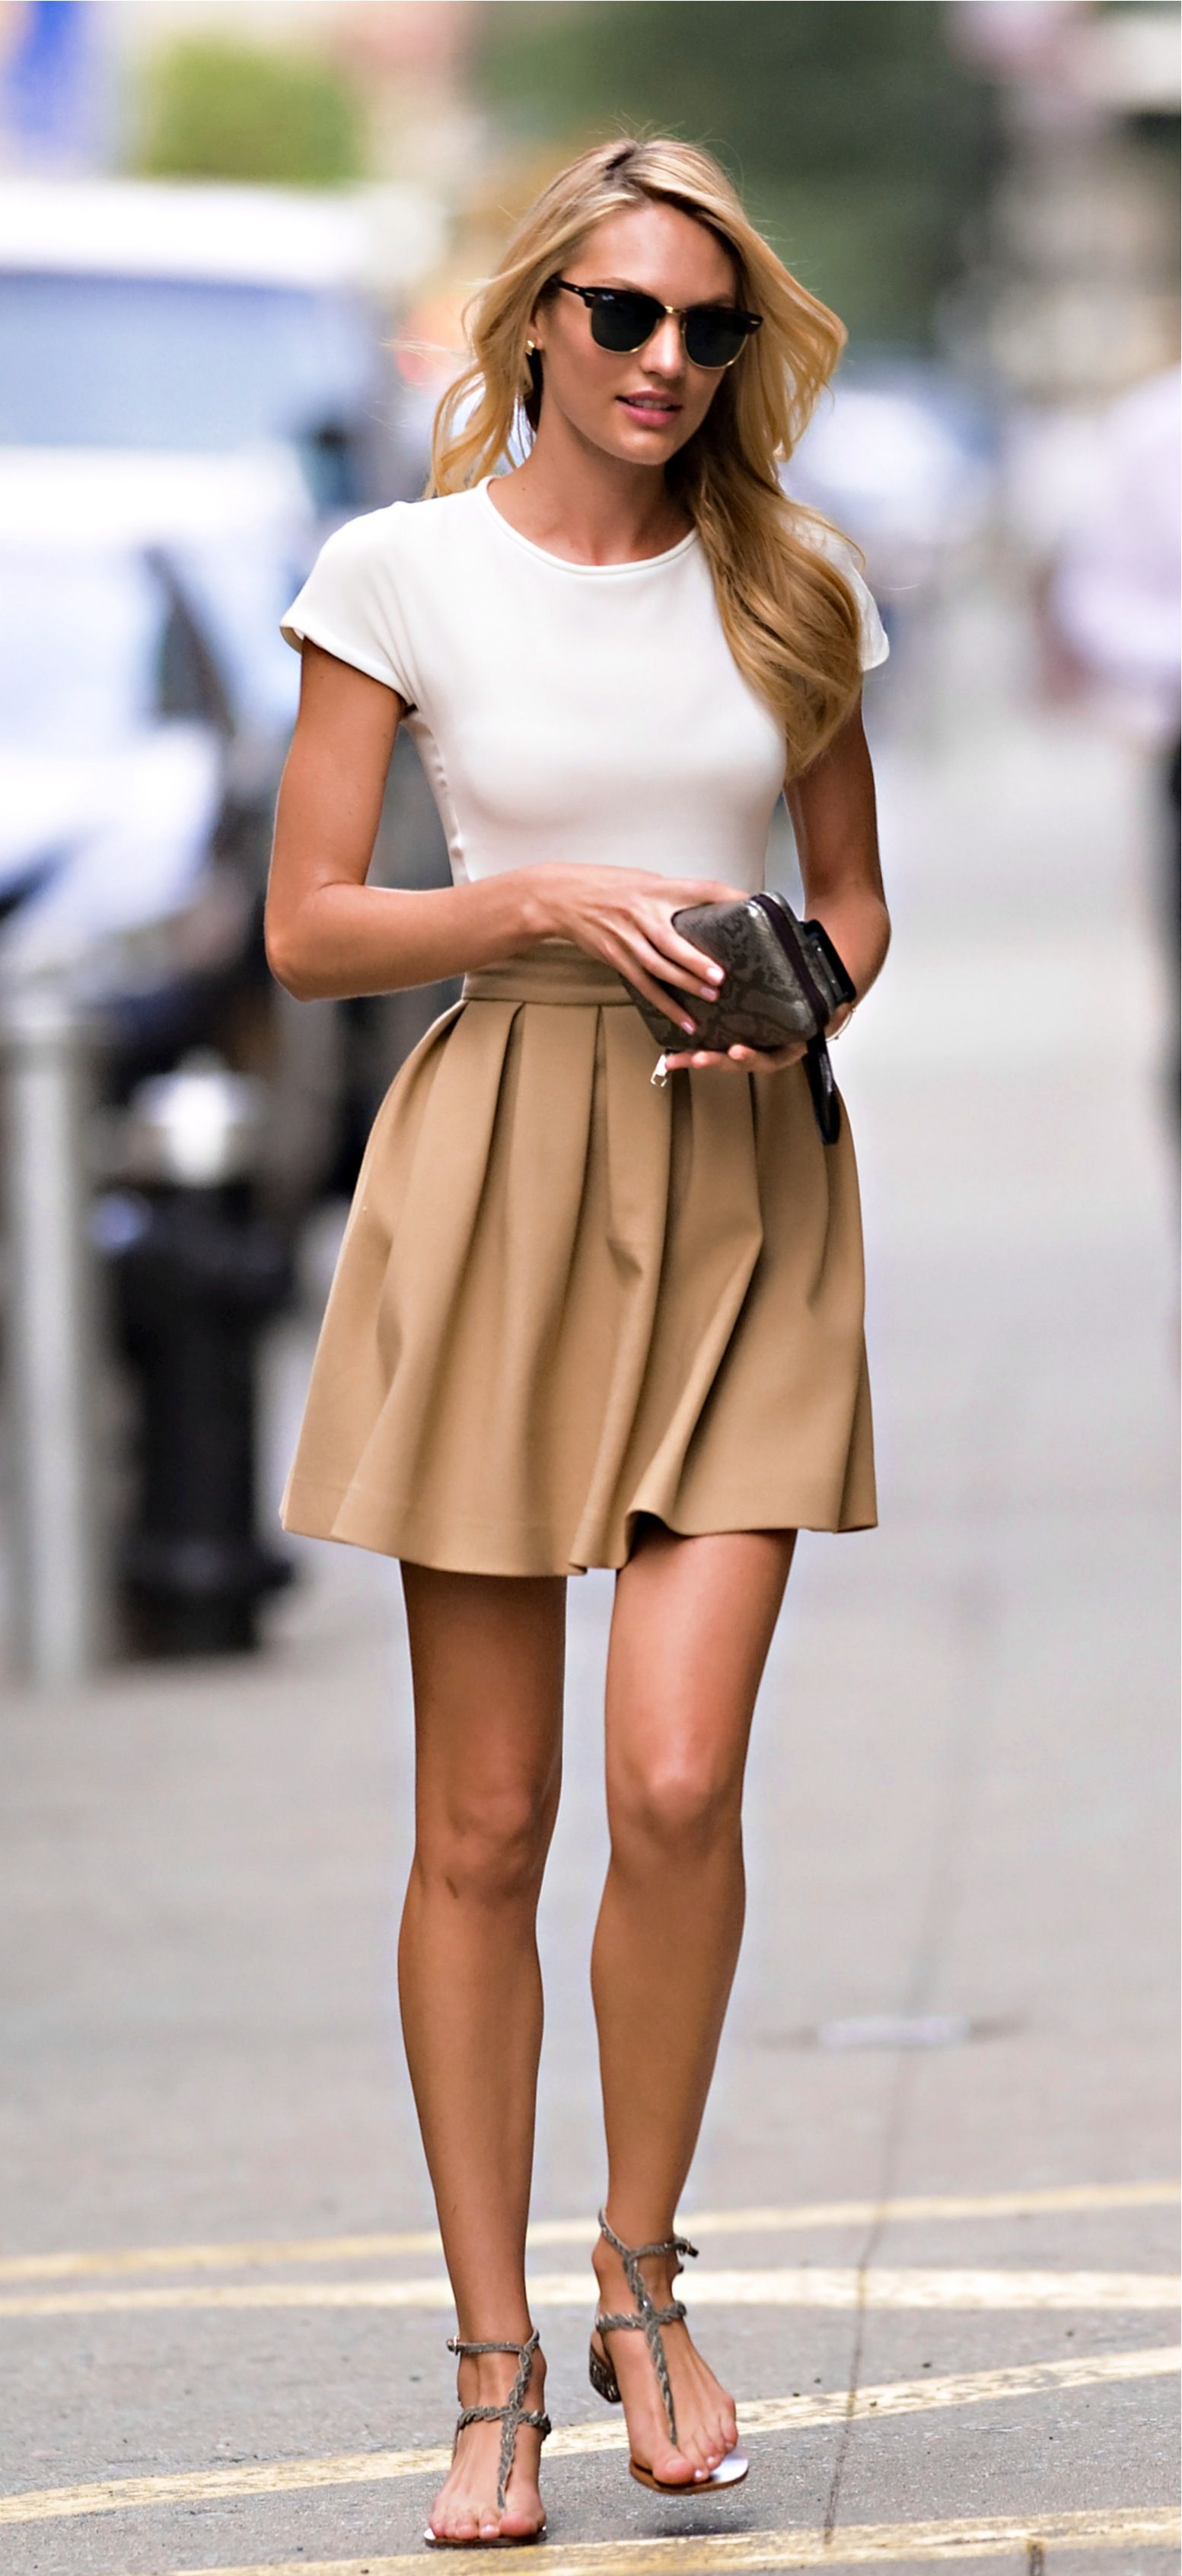 Candice Swanepoel Style Ray Ban Classic Camel Skirt I